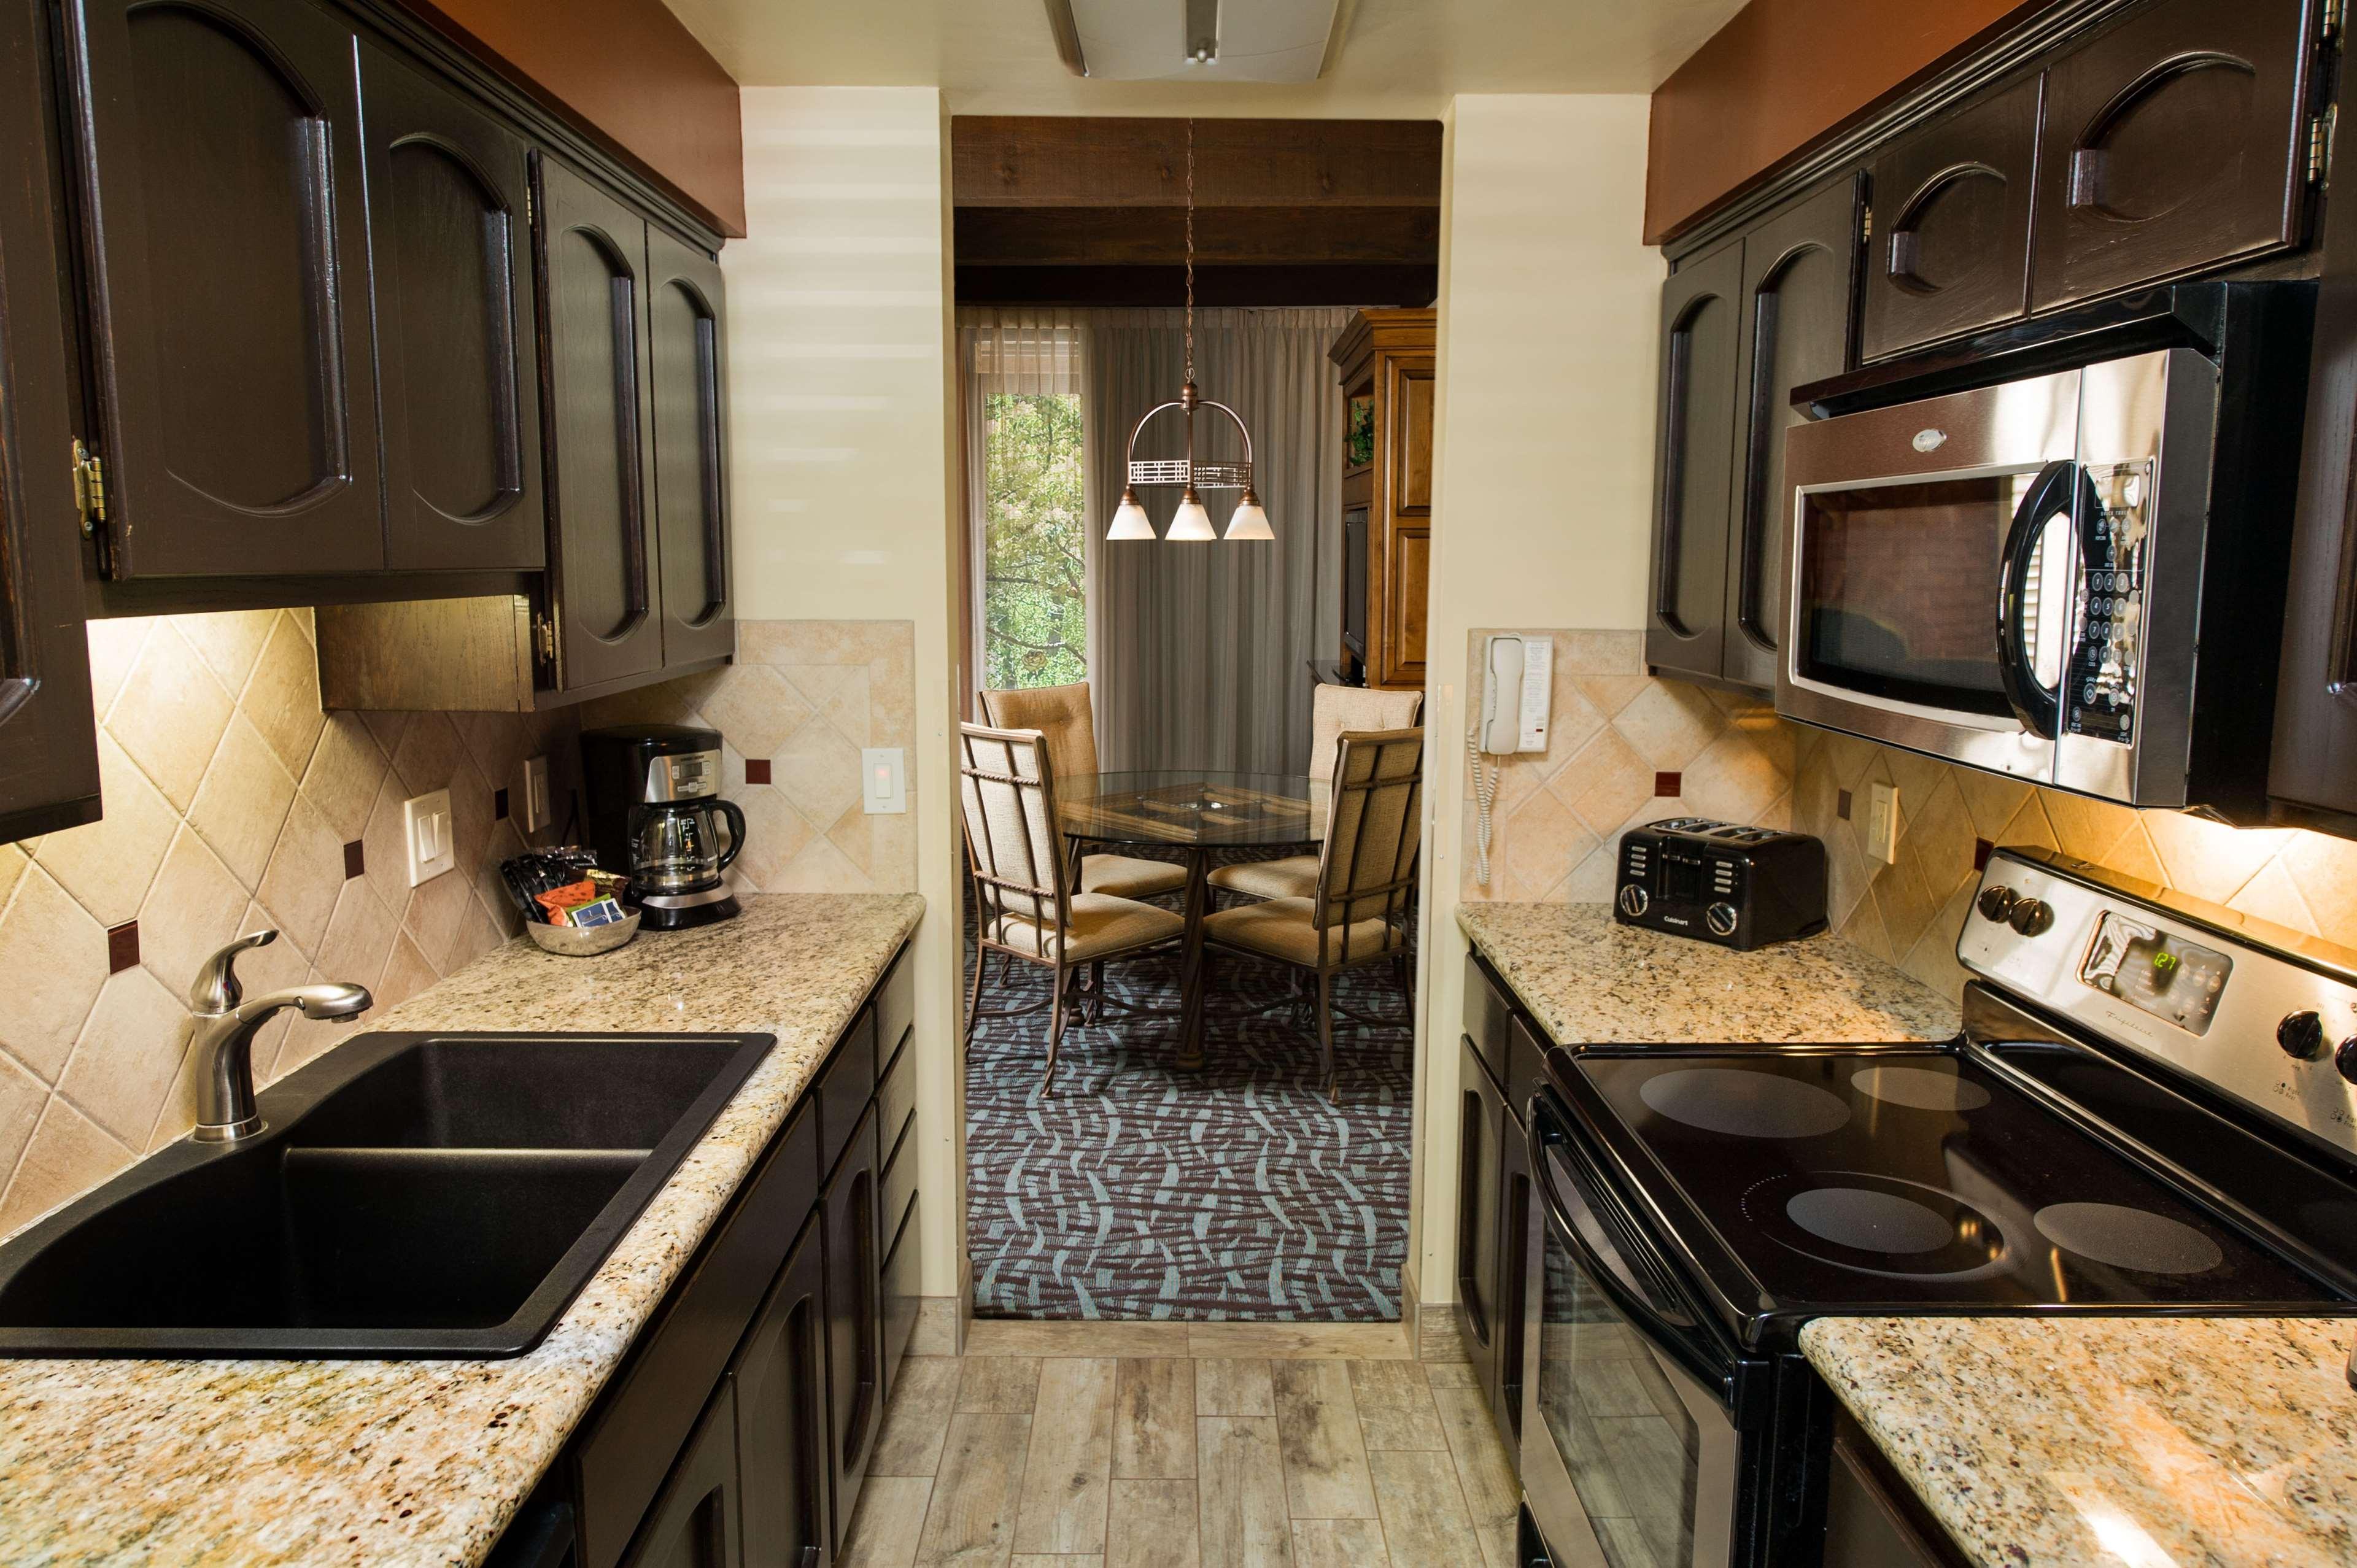 Best Western Plus Arroyo Roble Hotel & Creekside Villas image 28